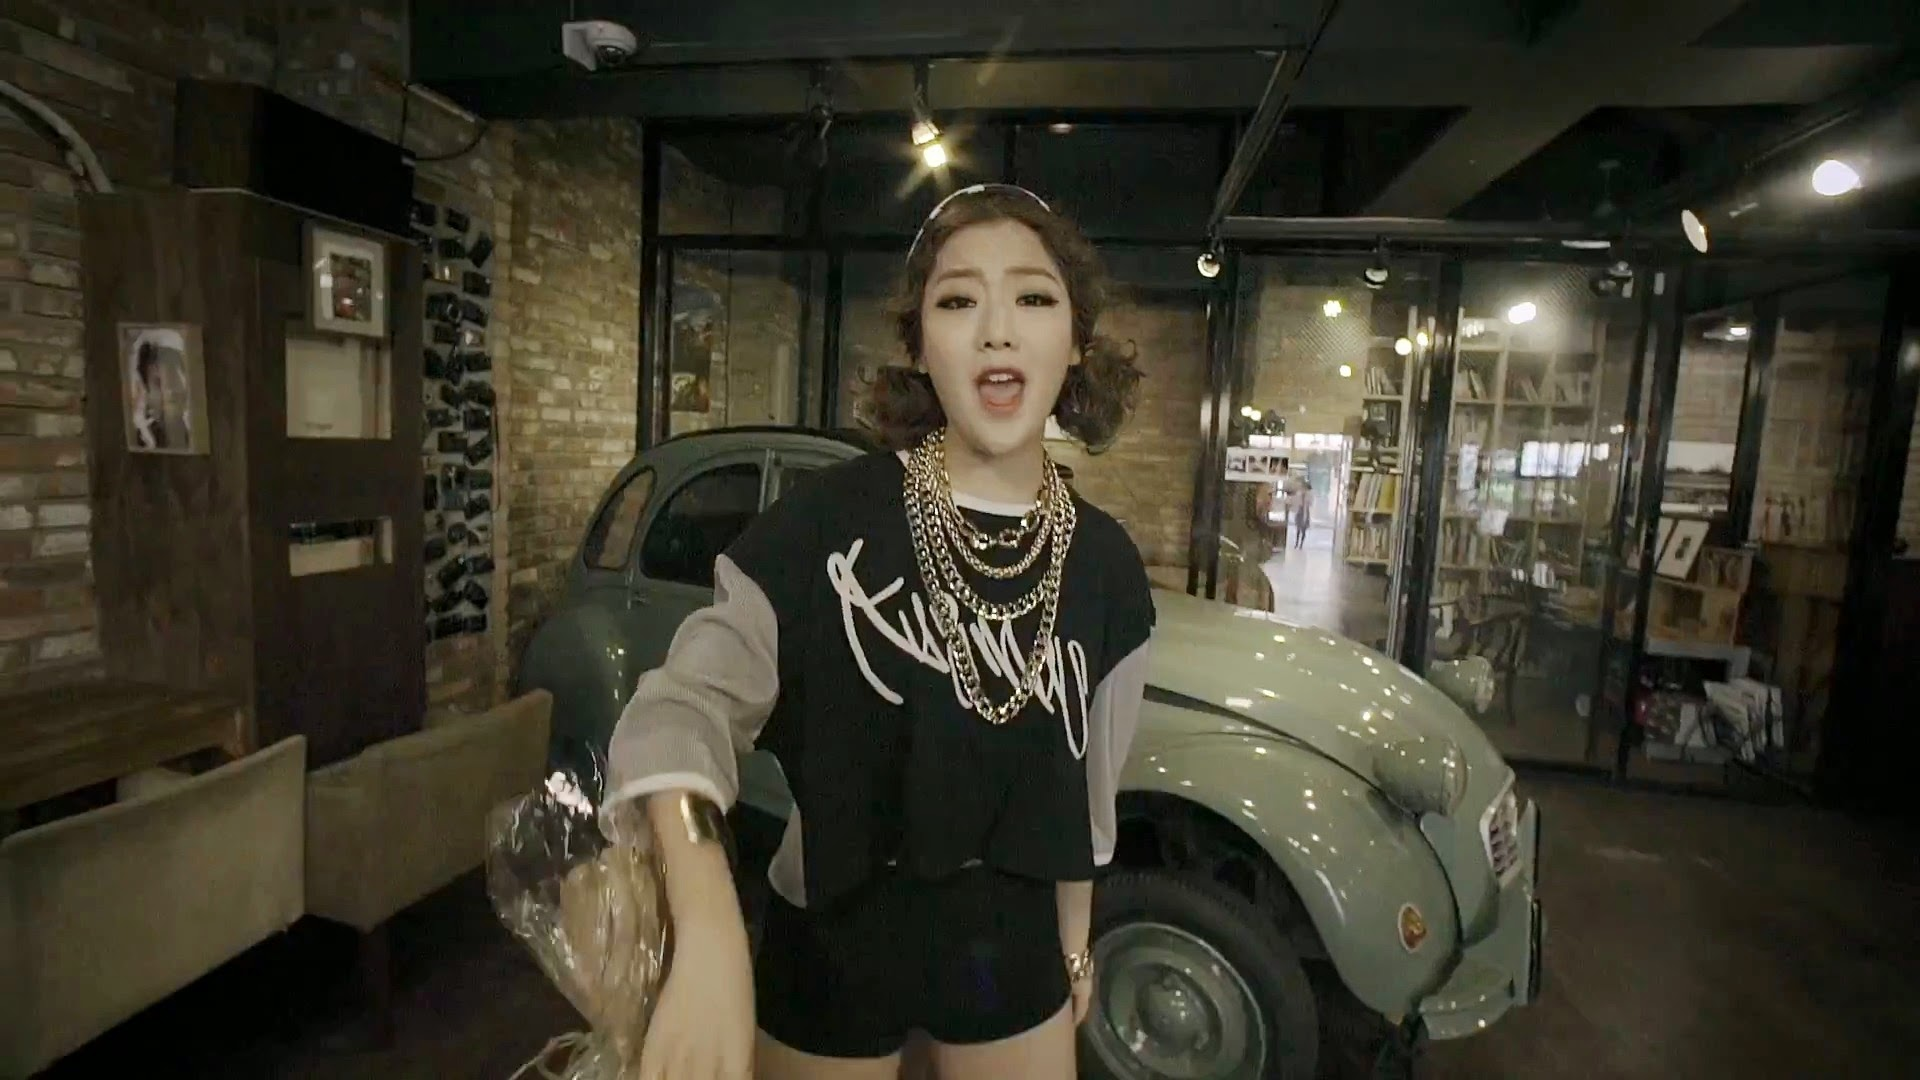 Kisum in Kisum x Lil Cham x Jace x Bora x Adoonga Feedback MV